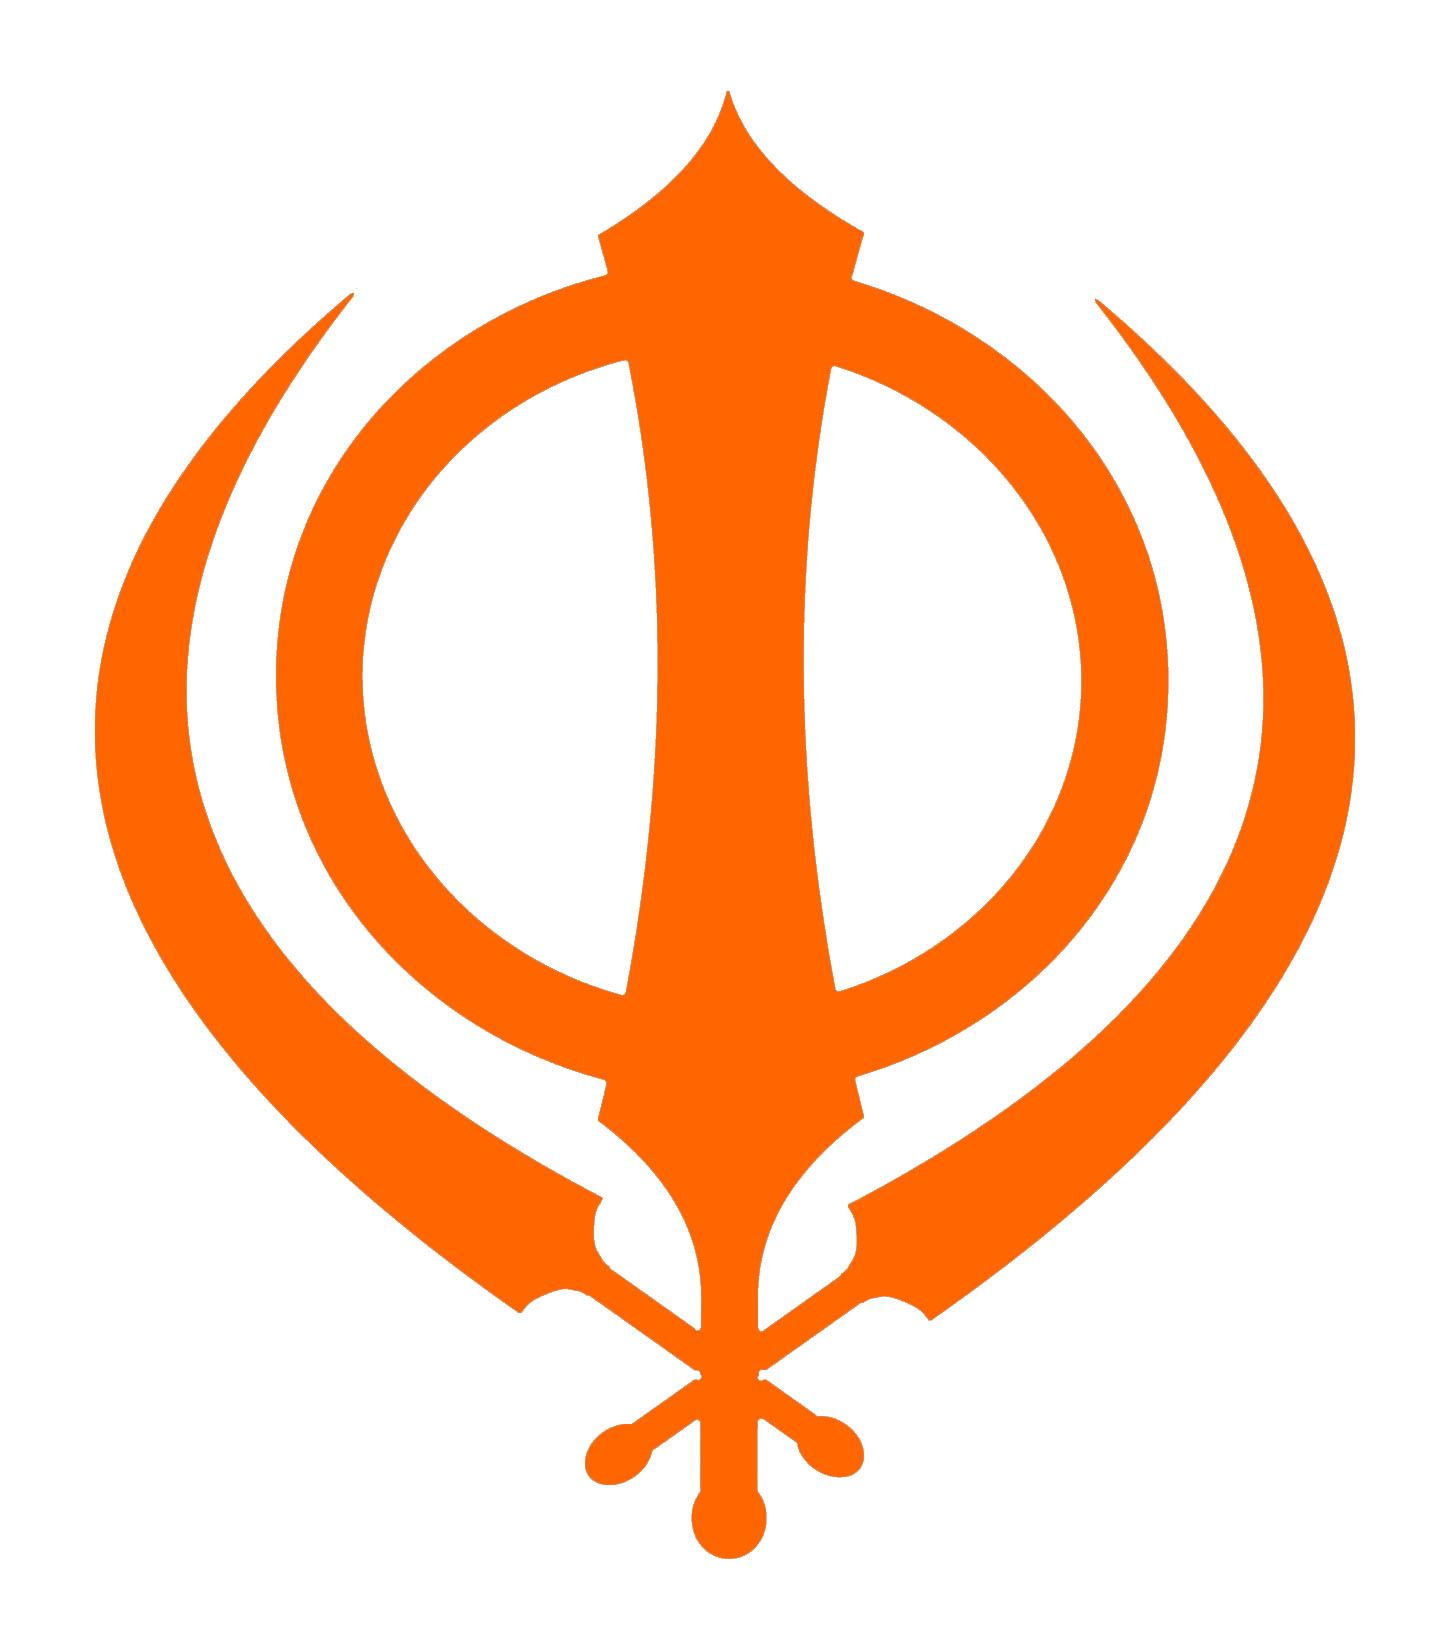 Ek Onkar Hd Wallpaper Sikh Symbol Simple Orange Khanda Flickr Photo Sharing